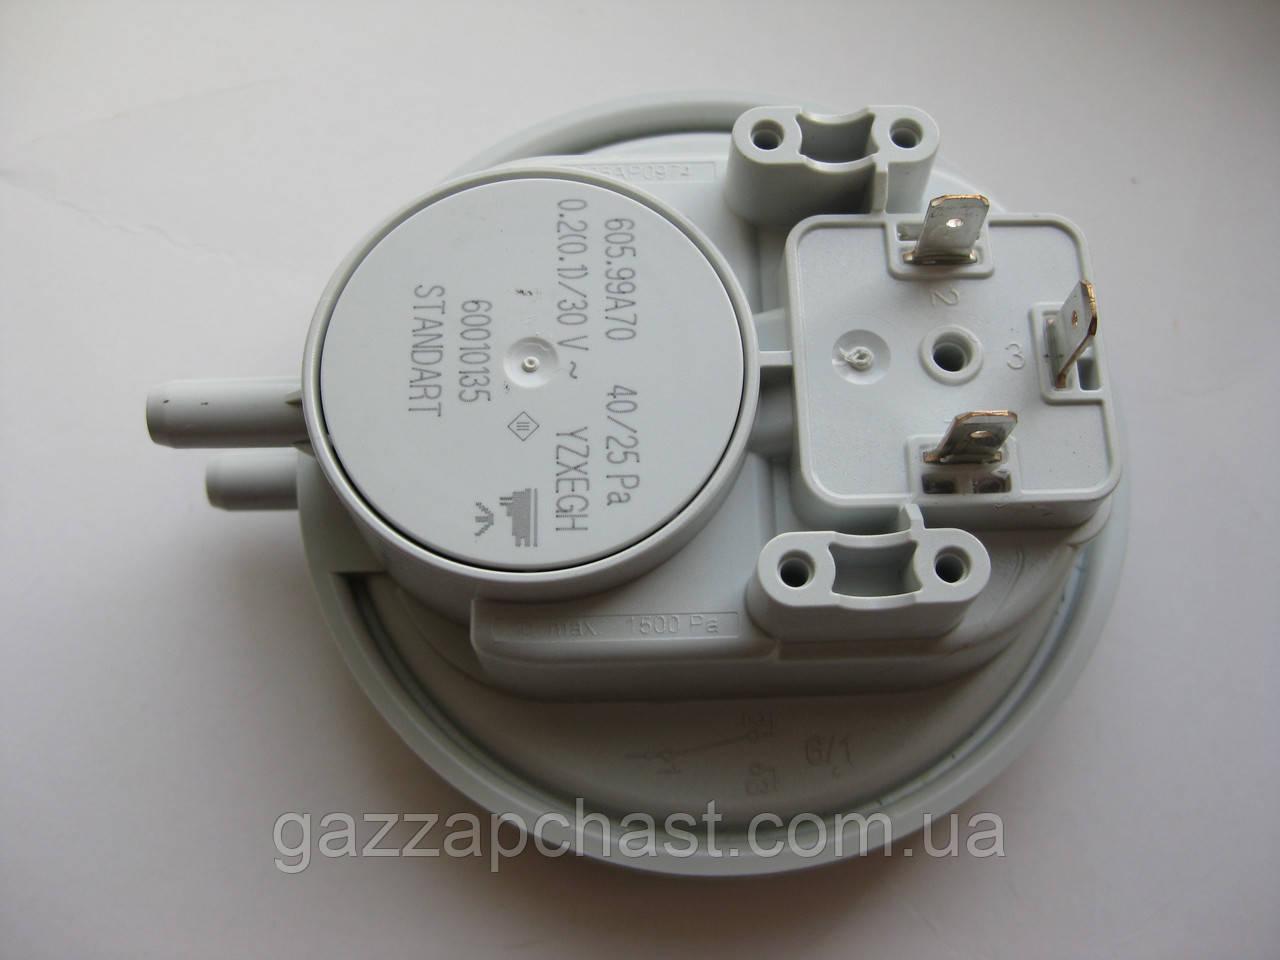 Датчик вентилятора (прессостат) Huba 40/25 Pa Demrad Atron, Nepto; Protherm Рысь (3003202405)